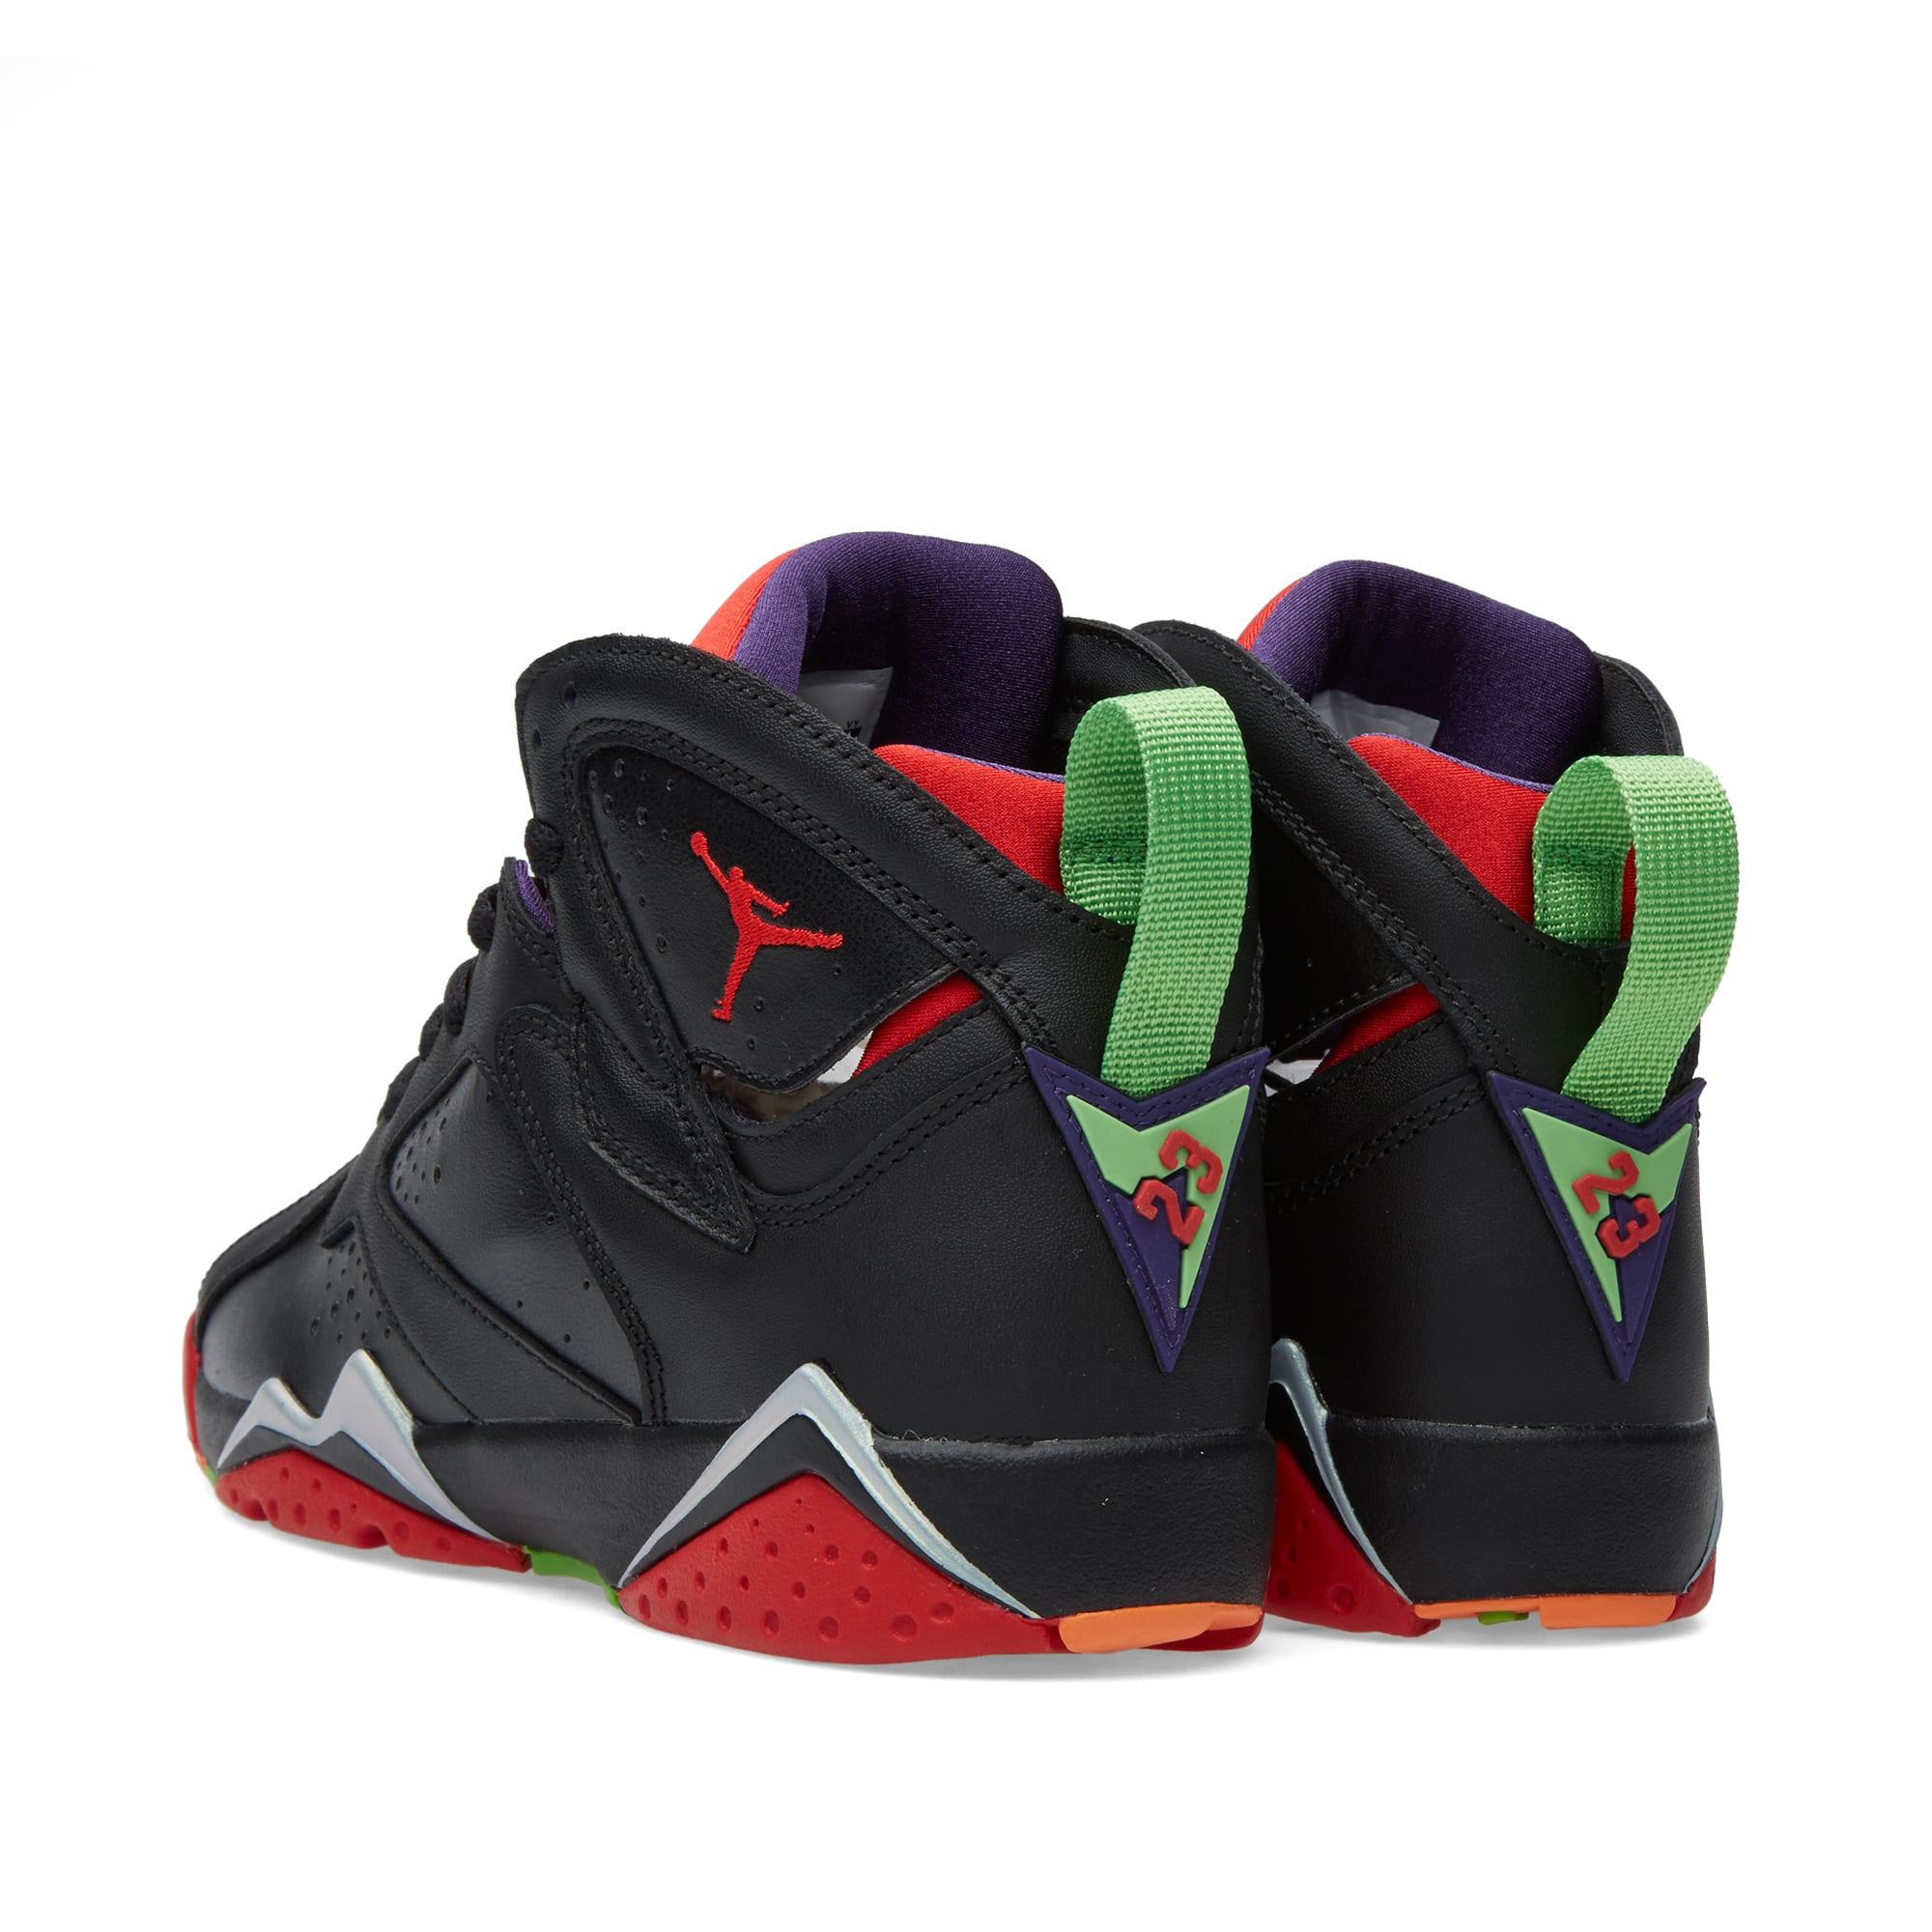 online retailer 5aebf bb5ad Nike Air Jordan VII Retro BG  Marvin The Martian  Black   University Red    END.